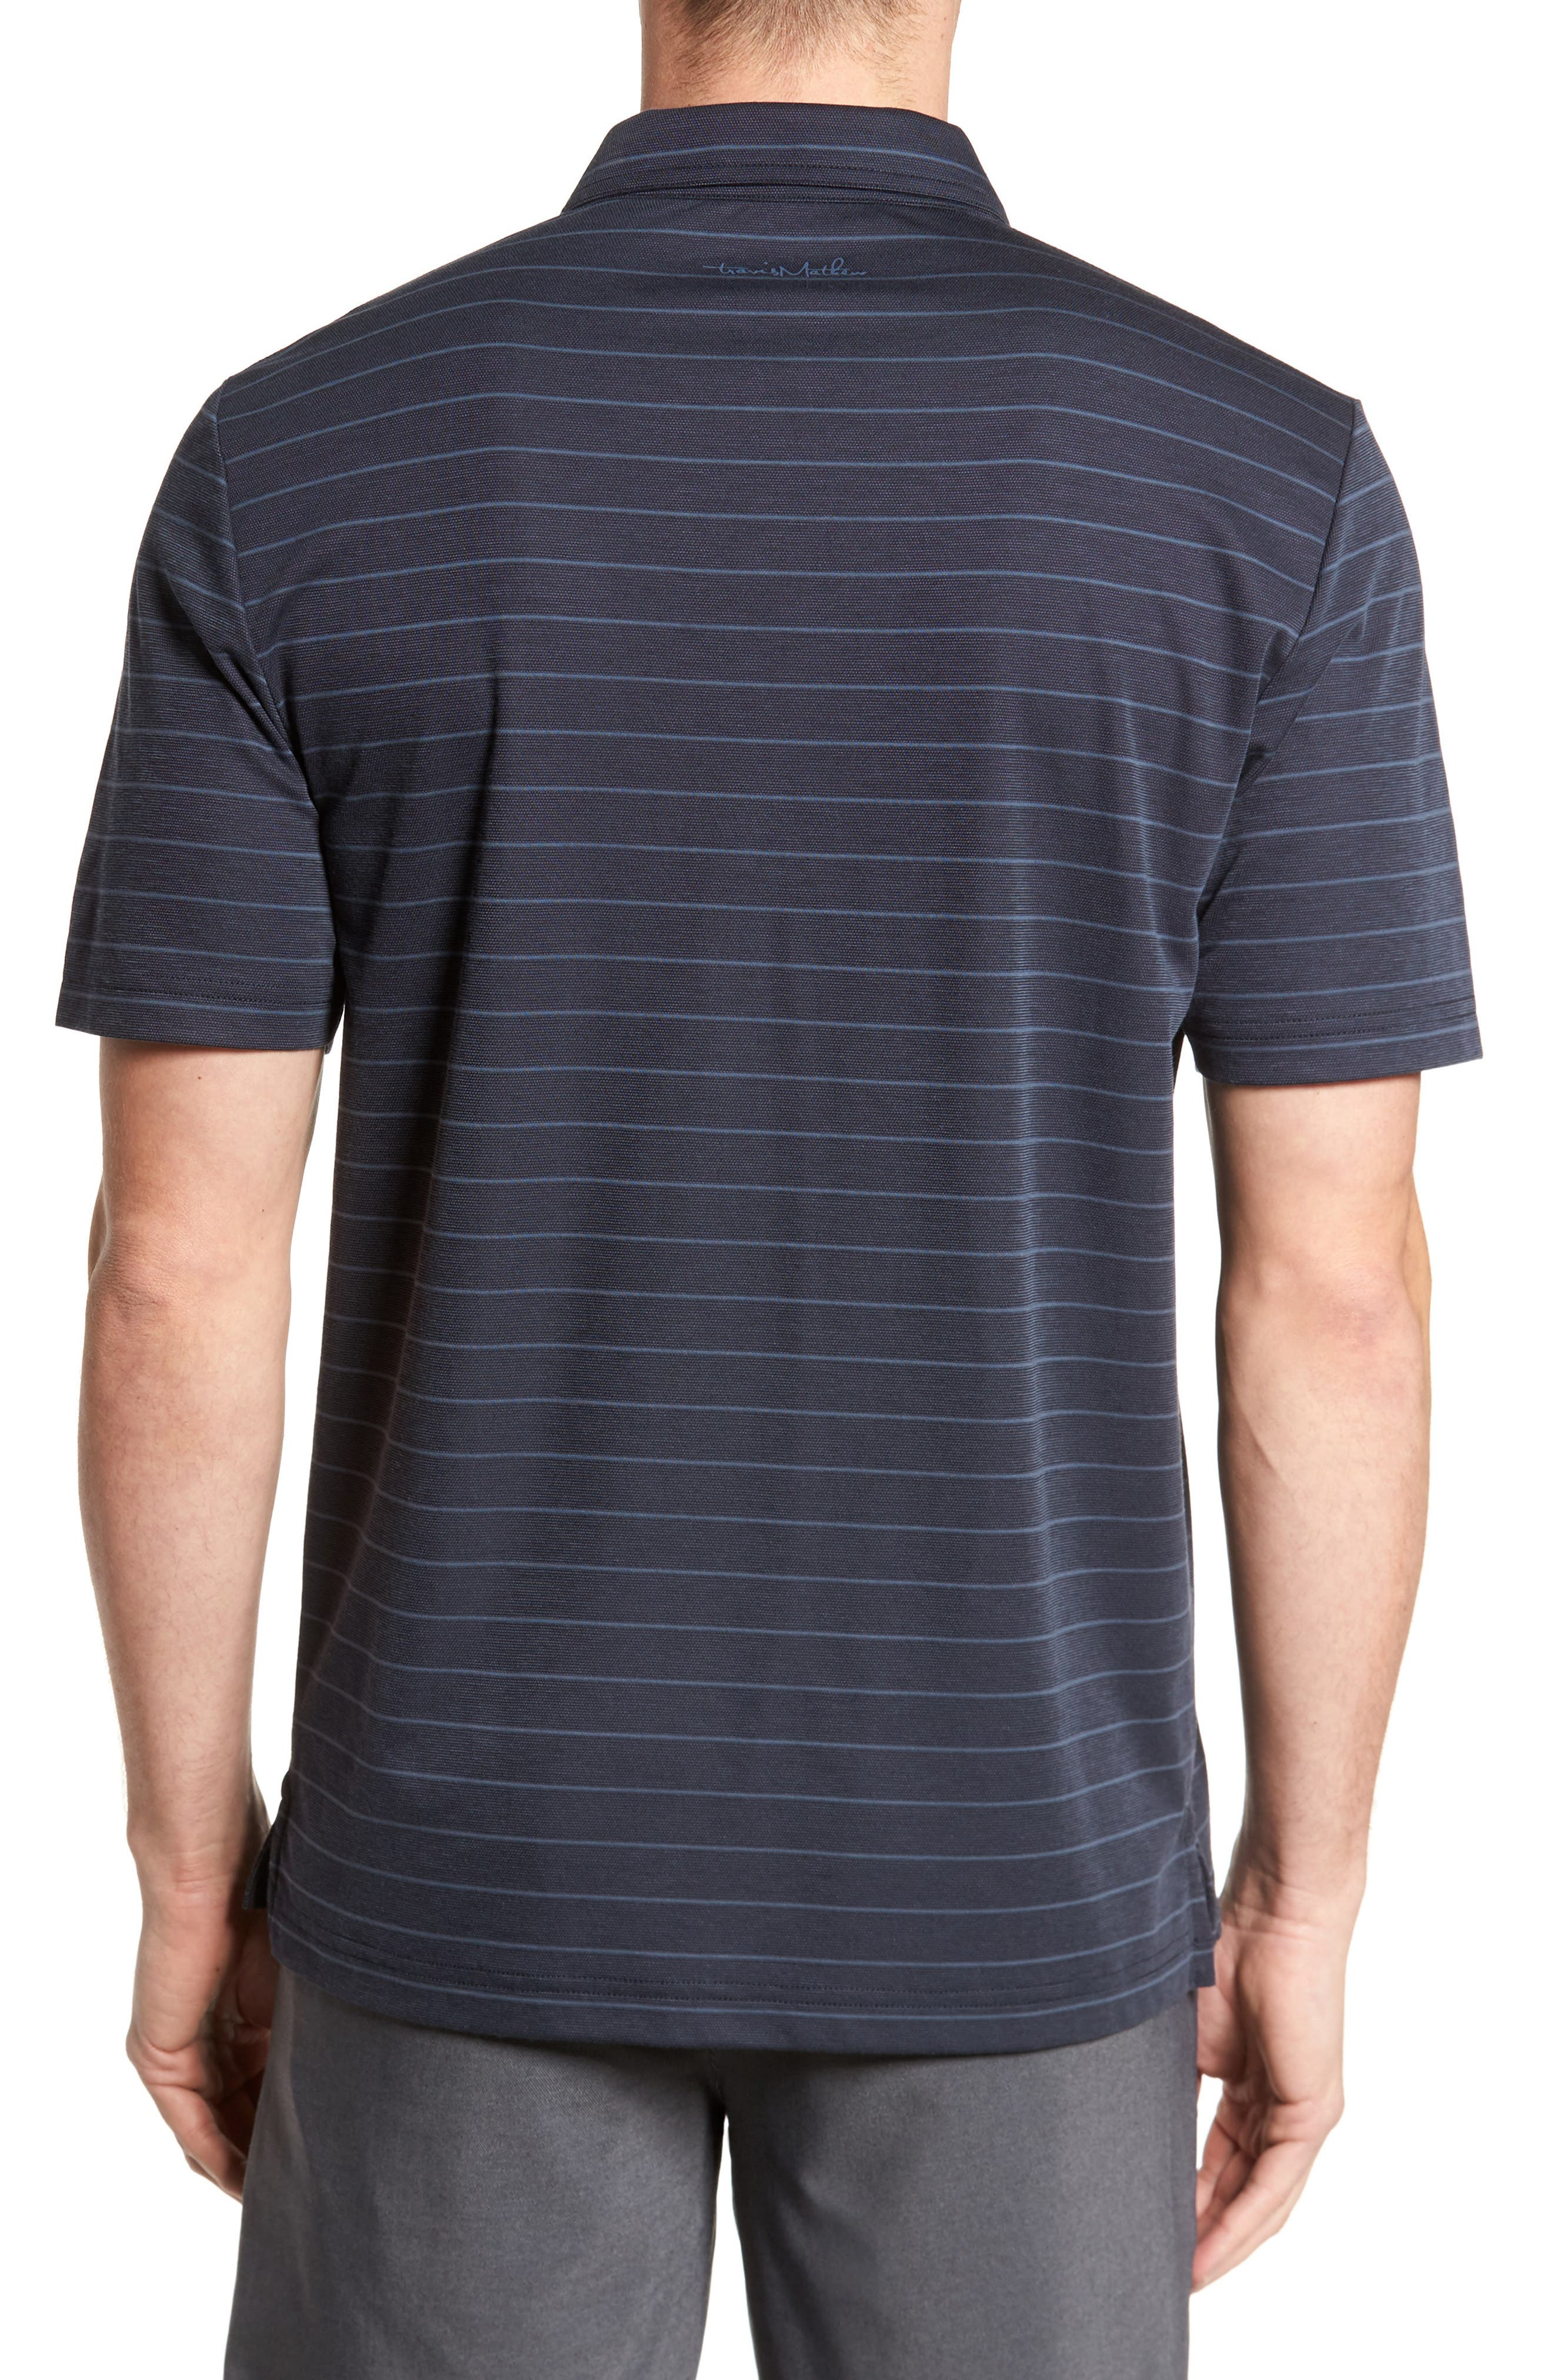 Marini Polo Shirt,                             Alternate thumbnail 2, color,                             BLUE NIGHTS/ ALLURE